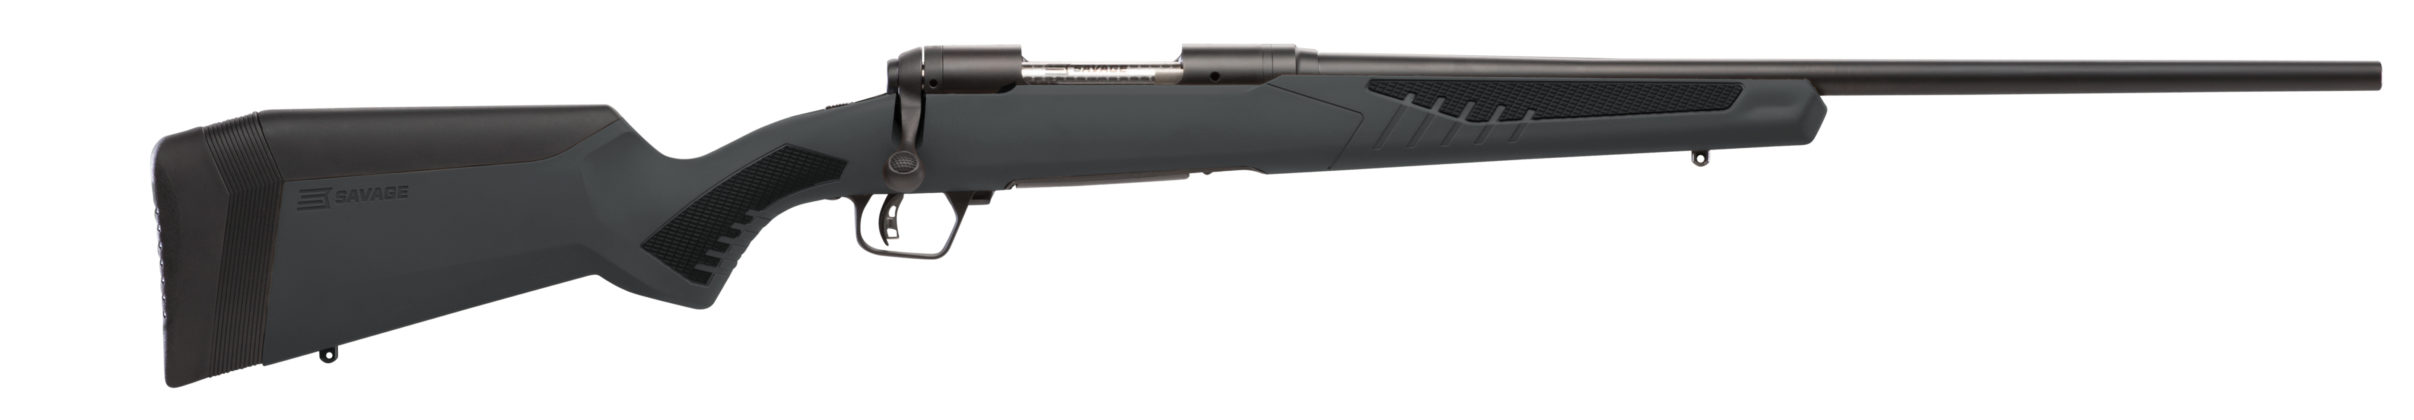 110 Hunter Savage